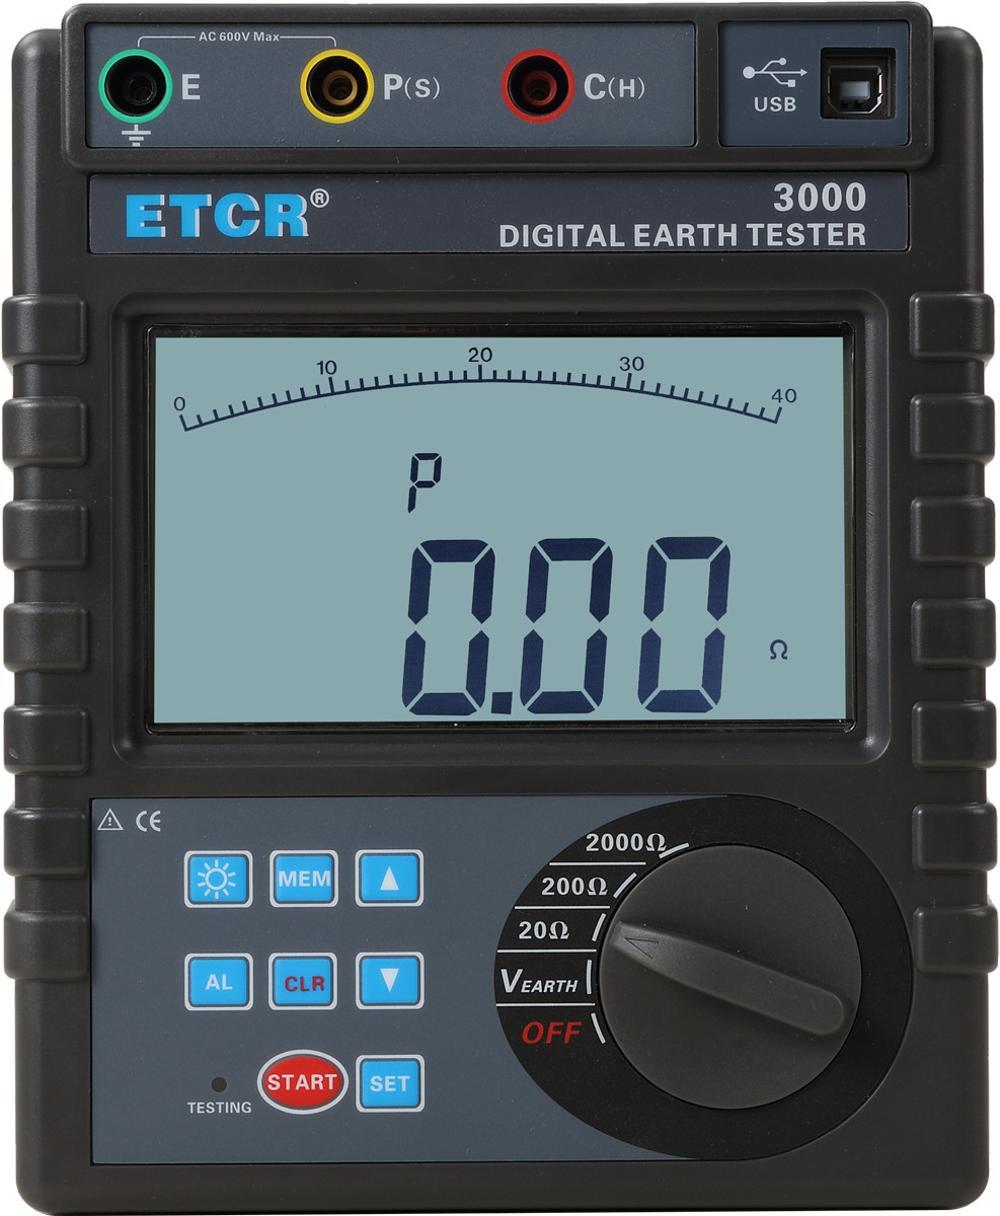 Harga Dan Spesifikasi Digital Earth Tester Terbaru 2018 Kyoritsu 4300 Etcr3000 Ground Resistance Meter Buy Testergroung Testerearth